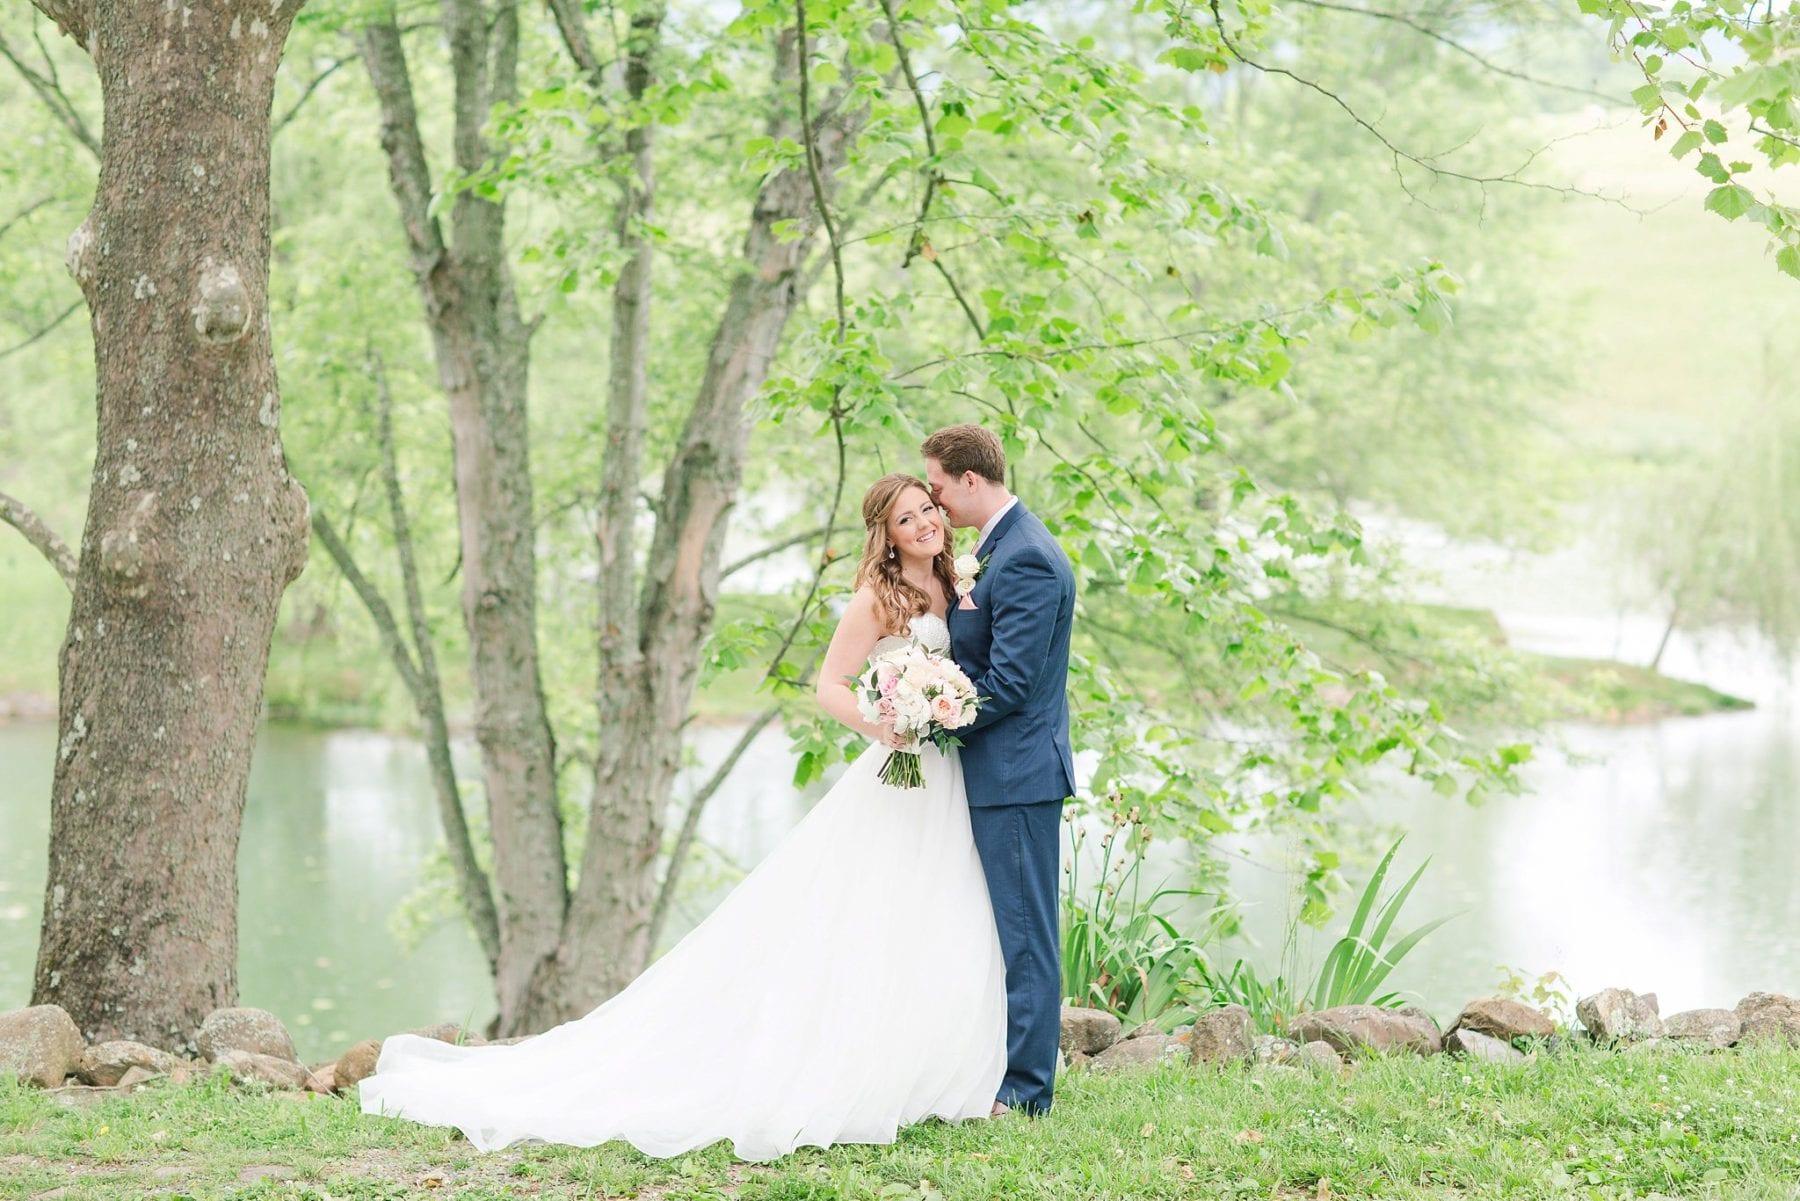 Justin & Megan Big Spring Farm Wedding Photos-94.jpg